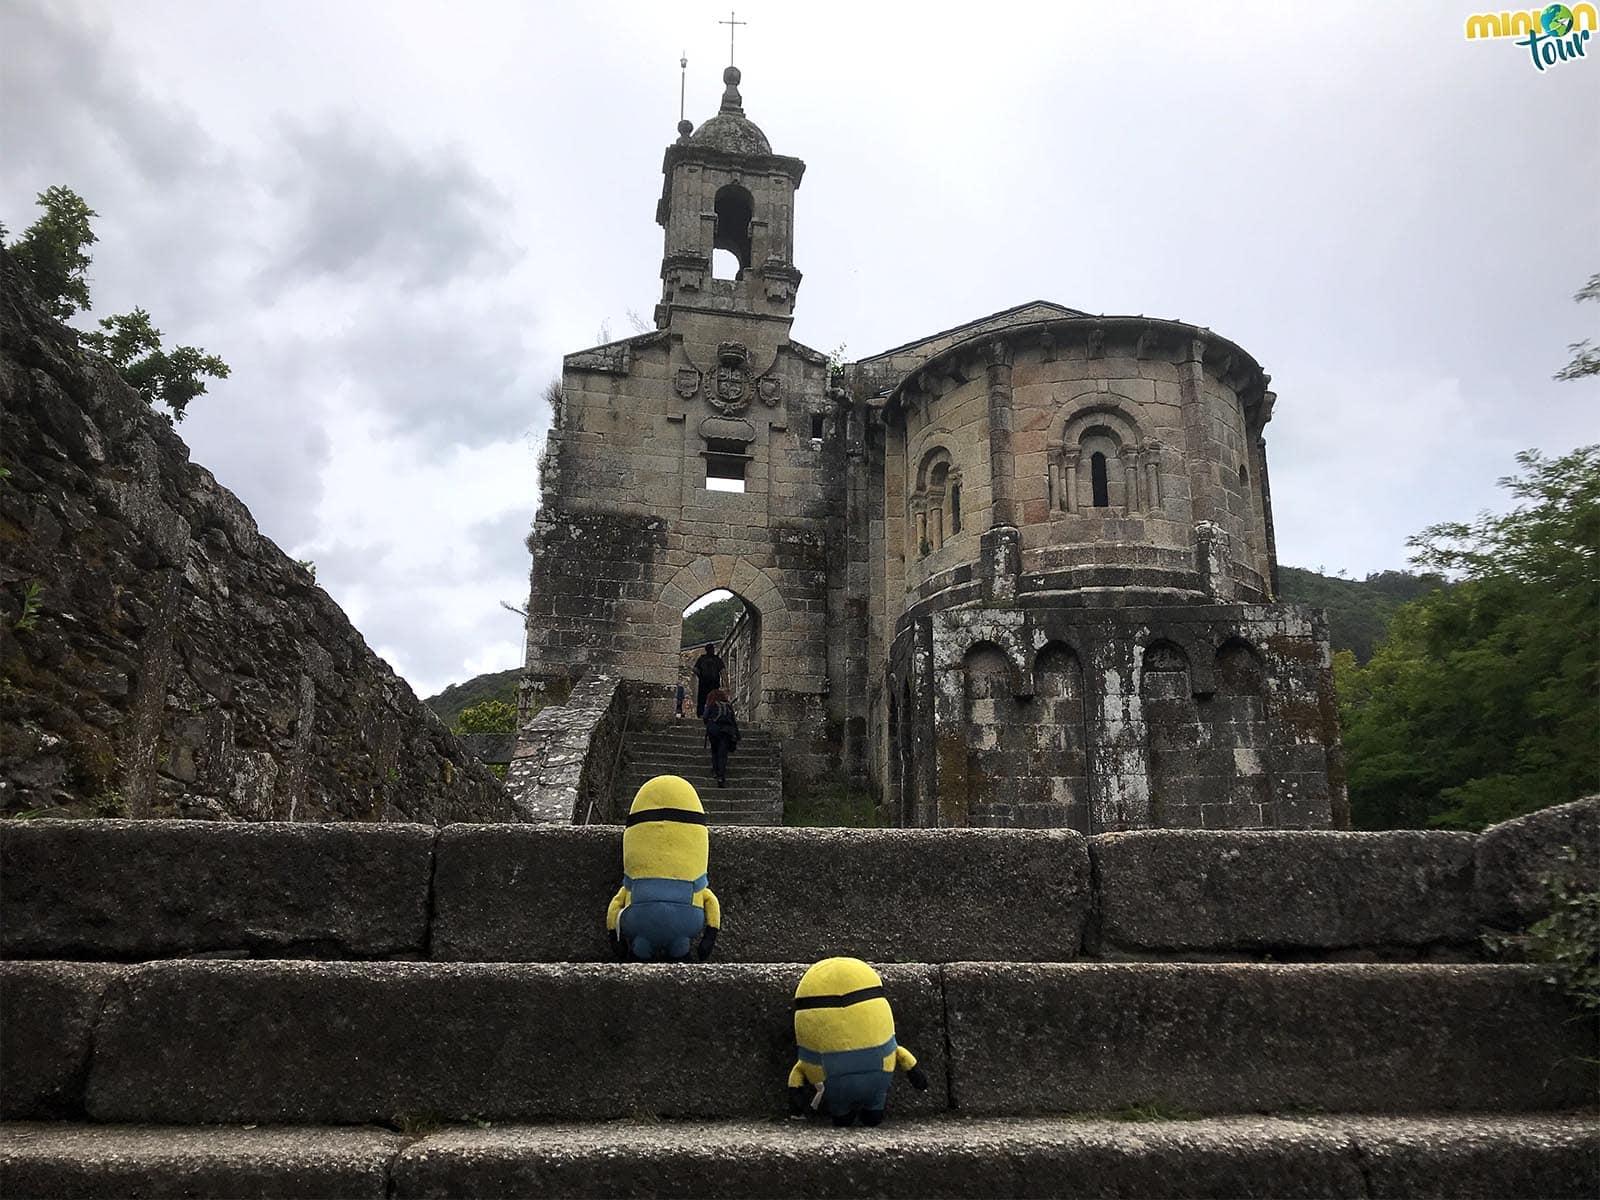 2 Minions en el Monasterio de Caaveiro en las Fragas do Eume